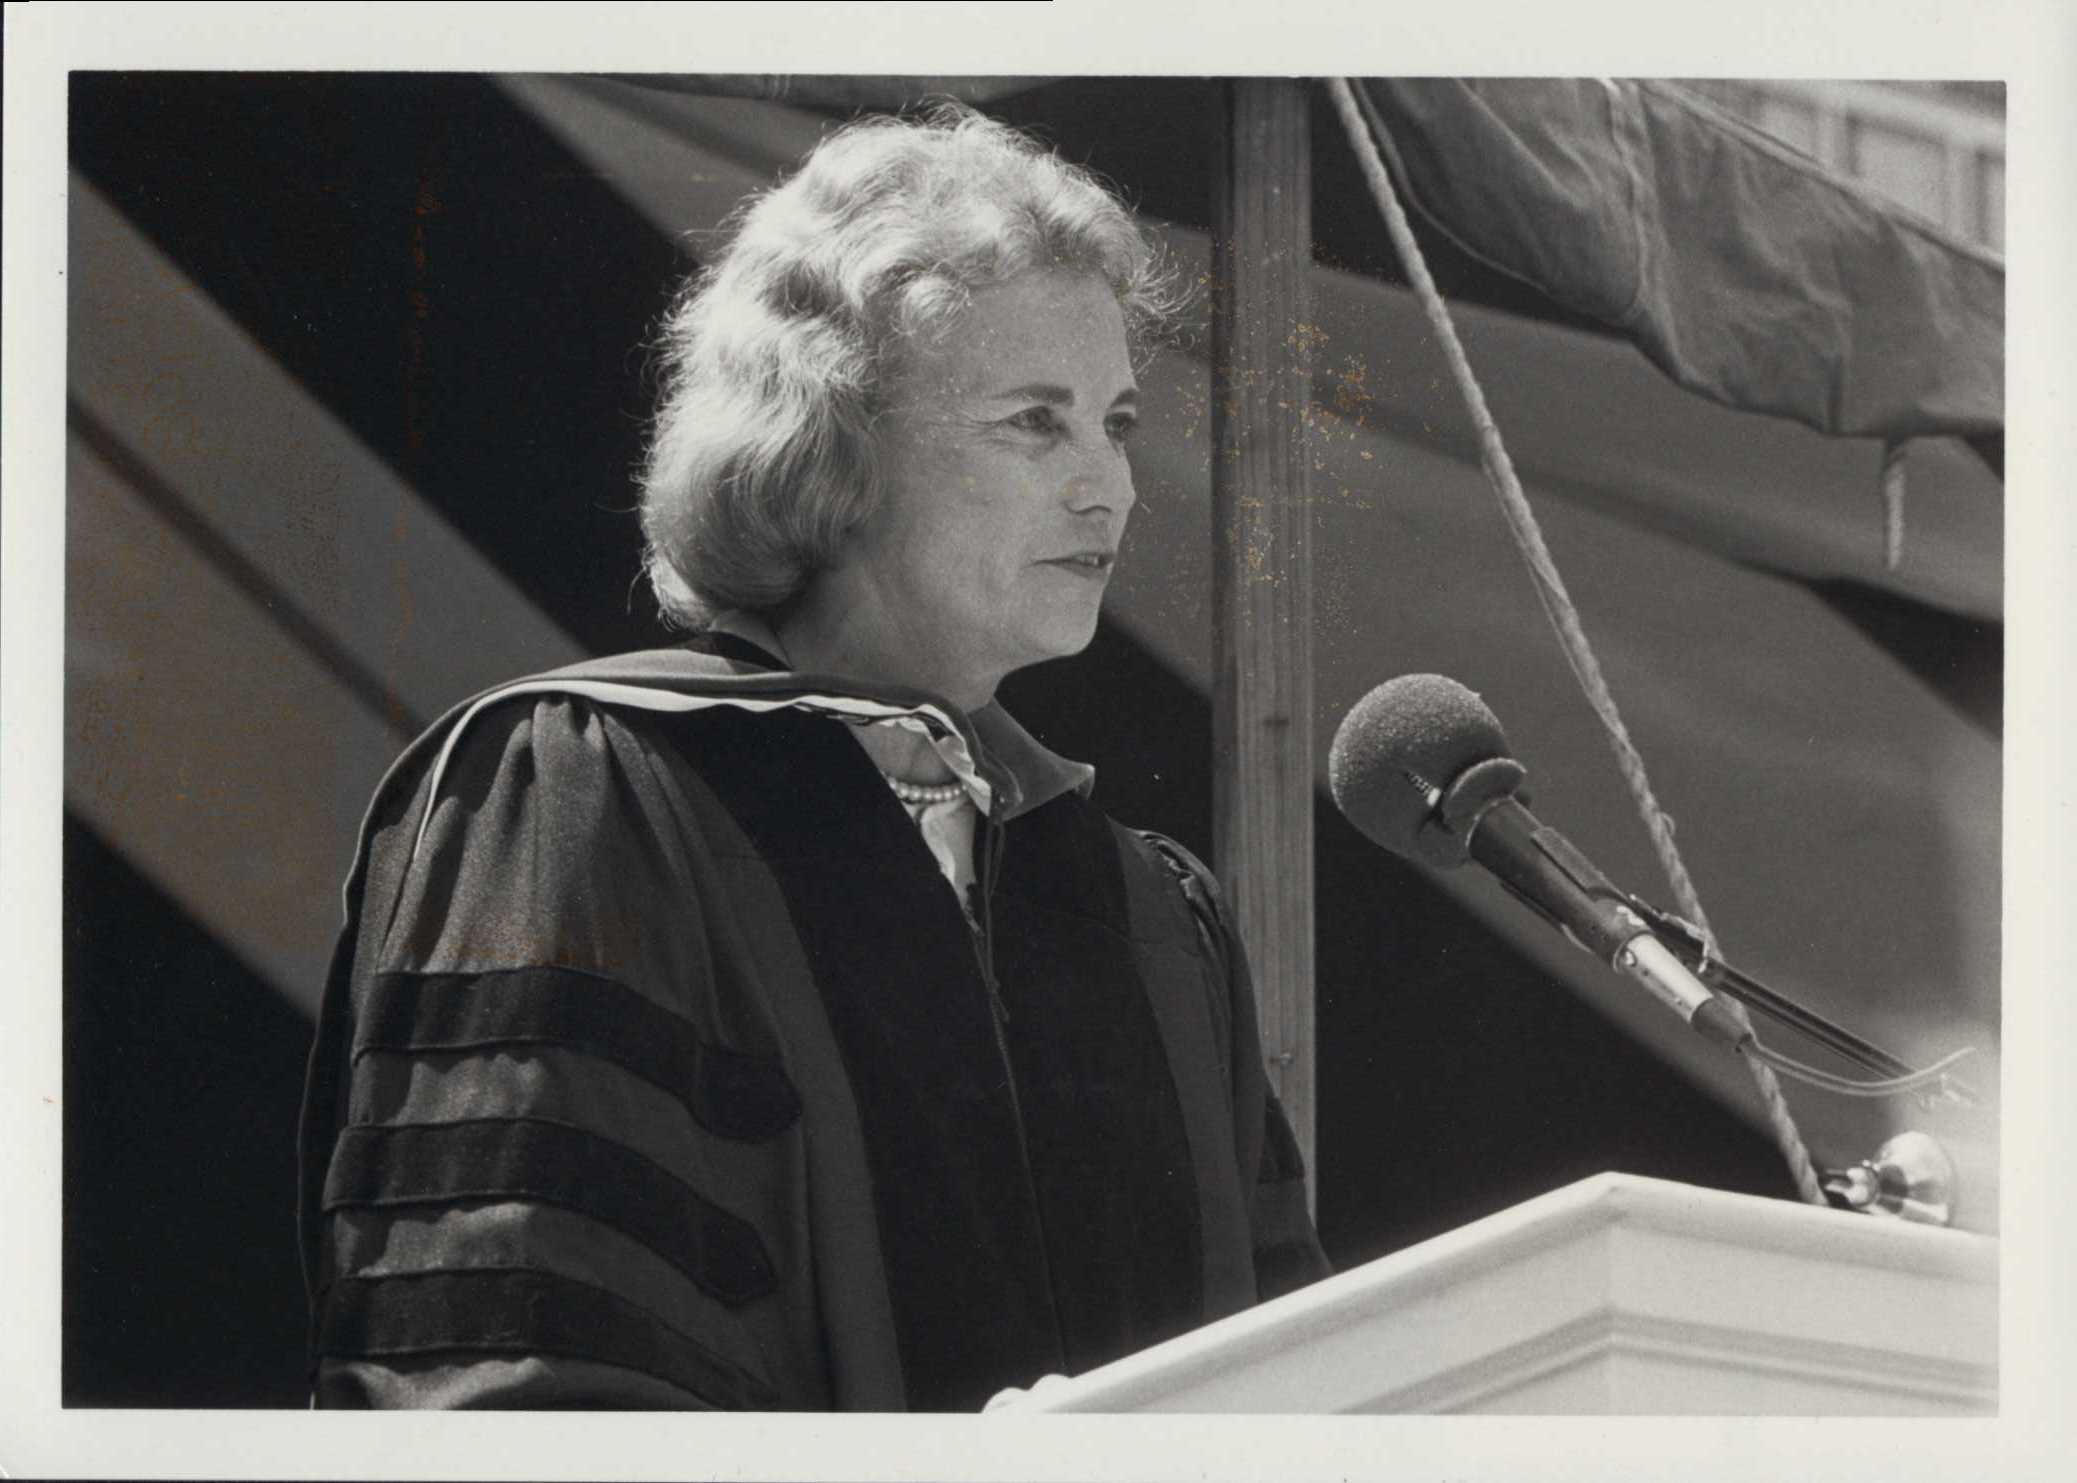 Sandra Day O'Connor at Wheaton